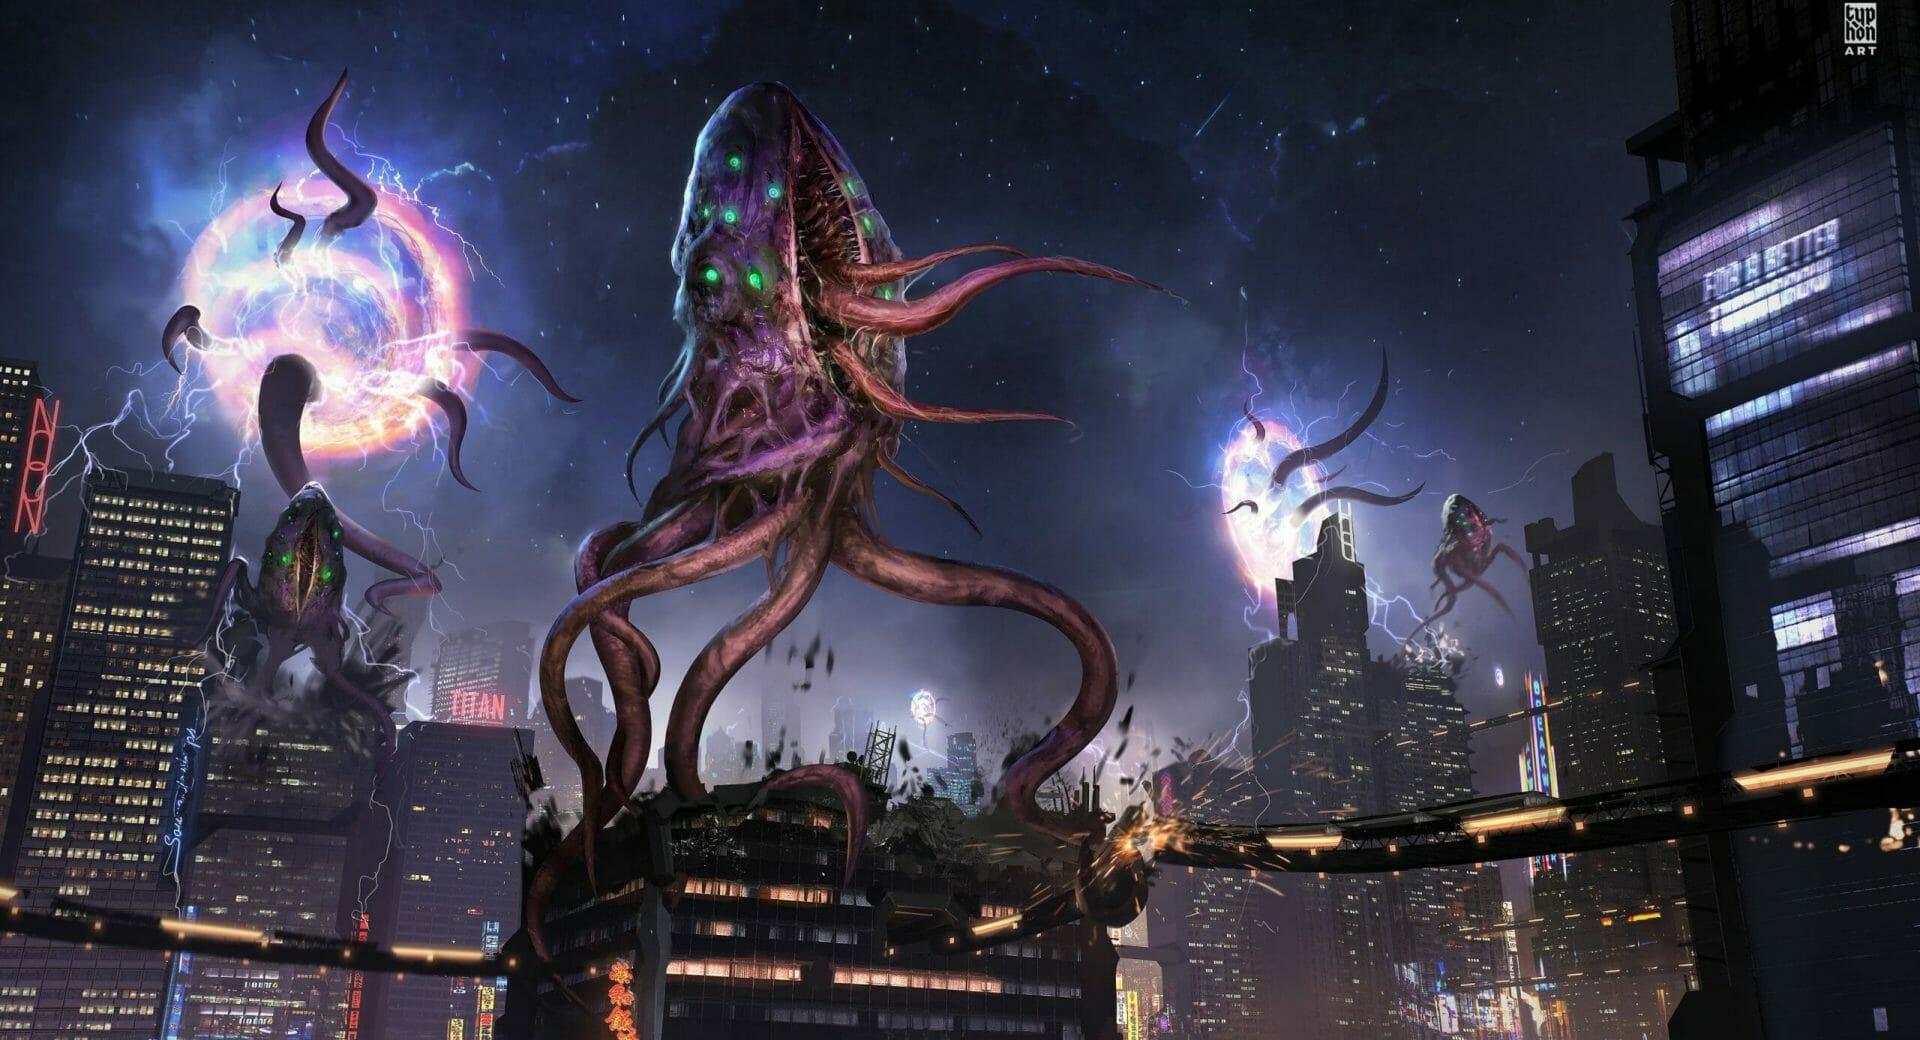 Tentacle Monster by Eryk Szczygiel.